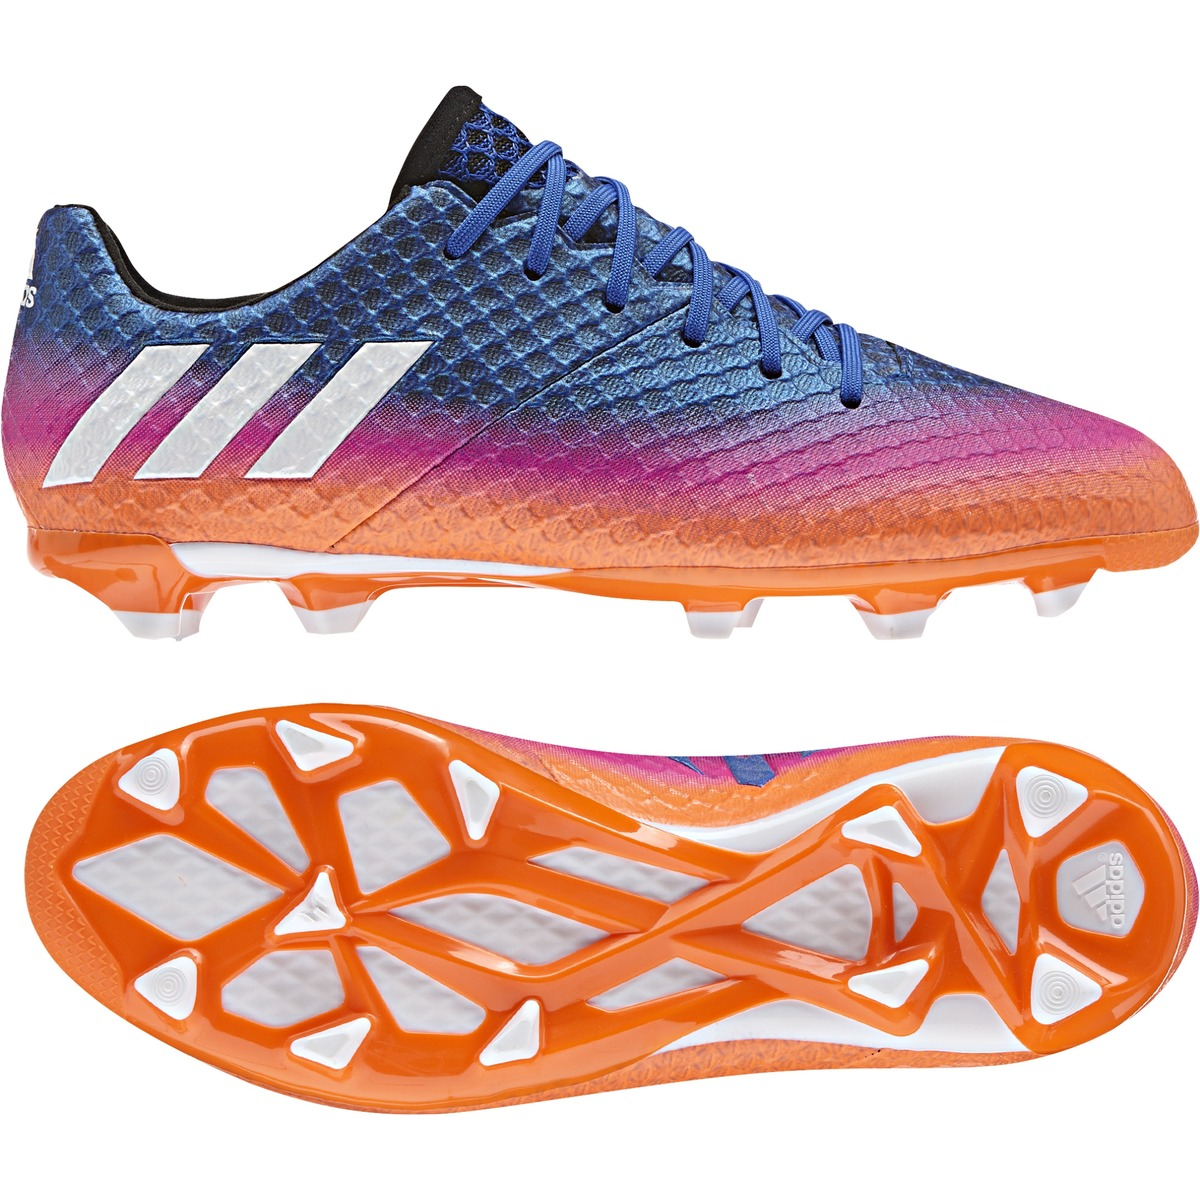 09d7caa6 Buy adidas ace 16.1 fg leather fotballsko gul no. Shop every store ...